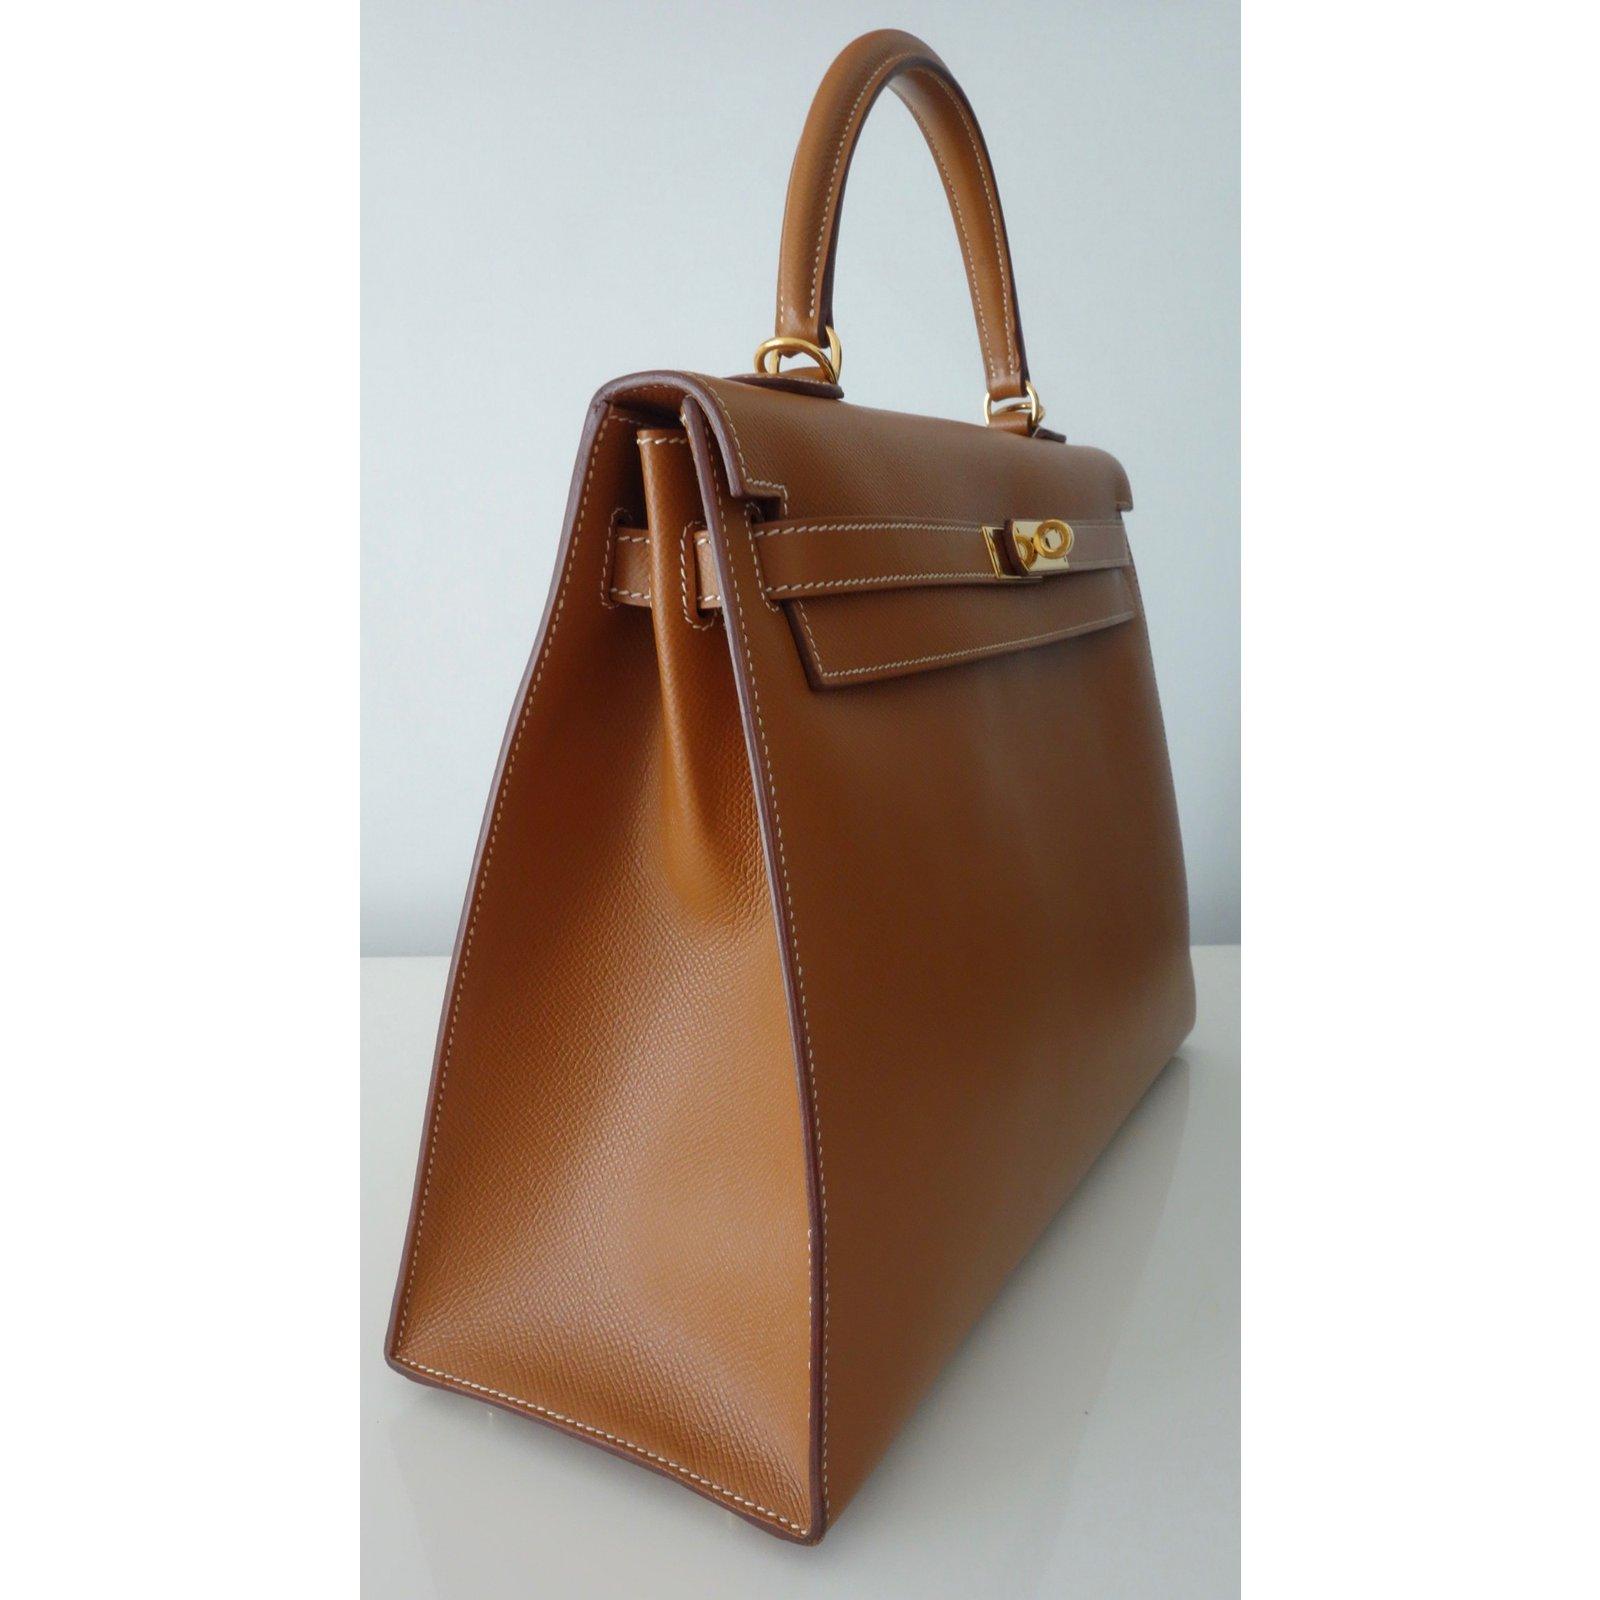 Hermès SAC HERMES KELLY 35 Handbags Leather Golden ref.98509 - Joli Closet a53ead5c3e3